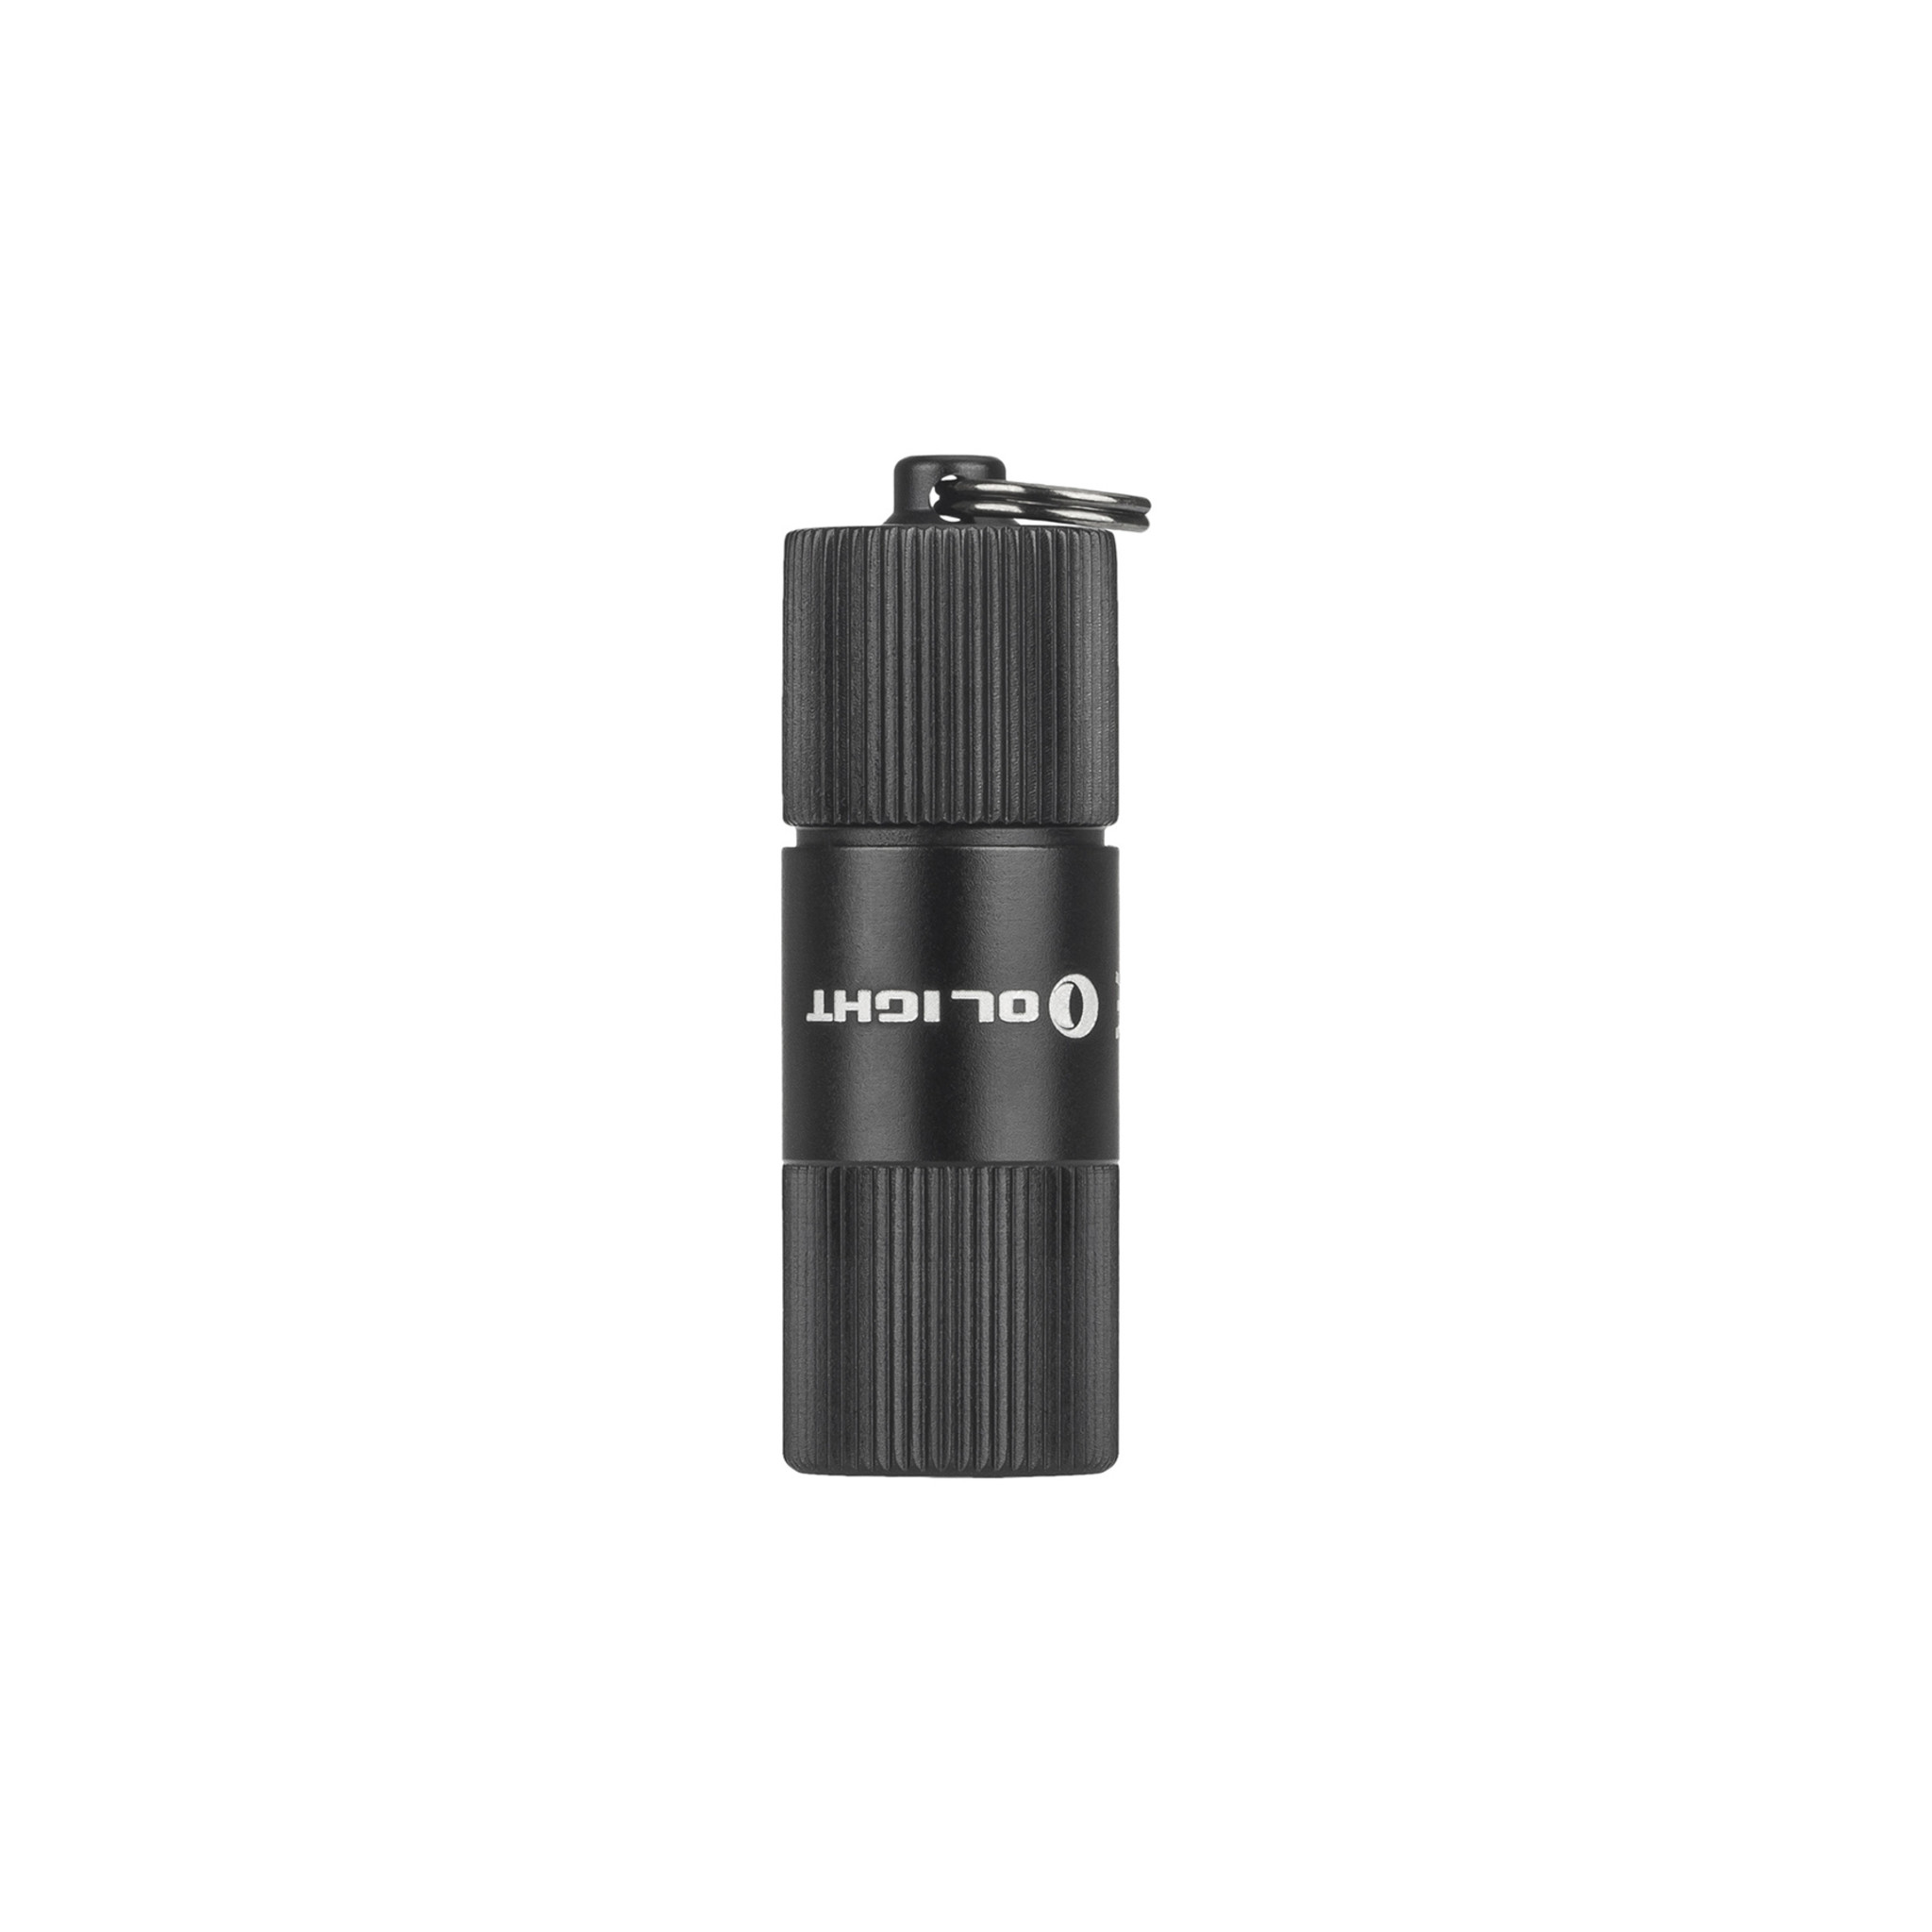 Olight Zaklamp I1R 2 EOS KIT - Max 150 Lumen